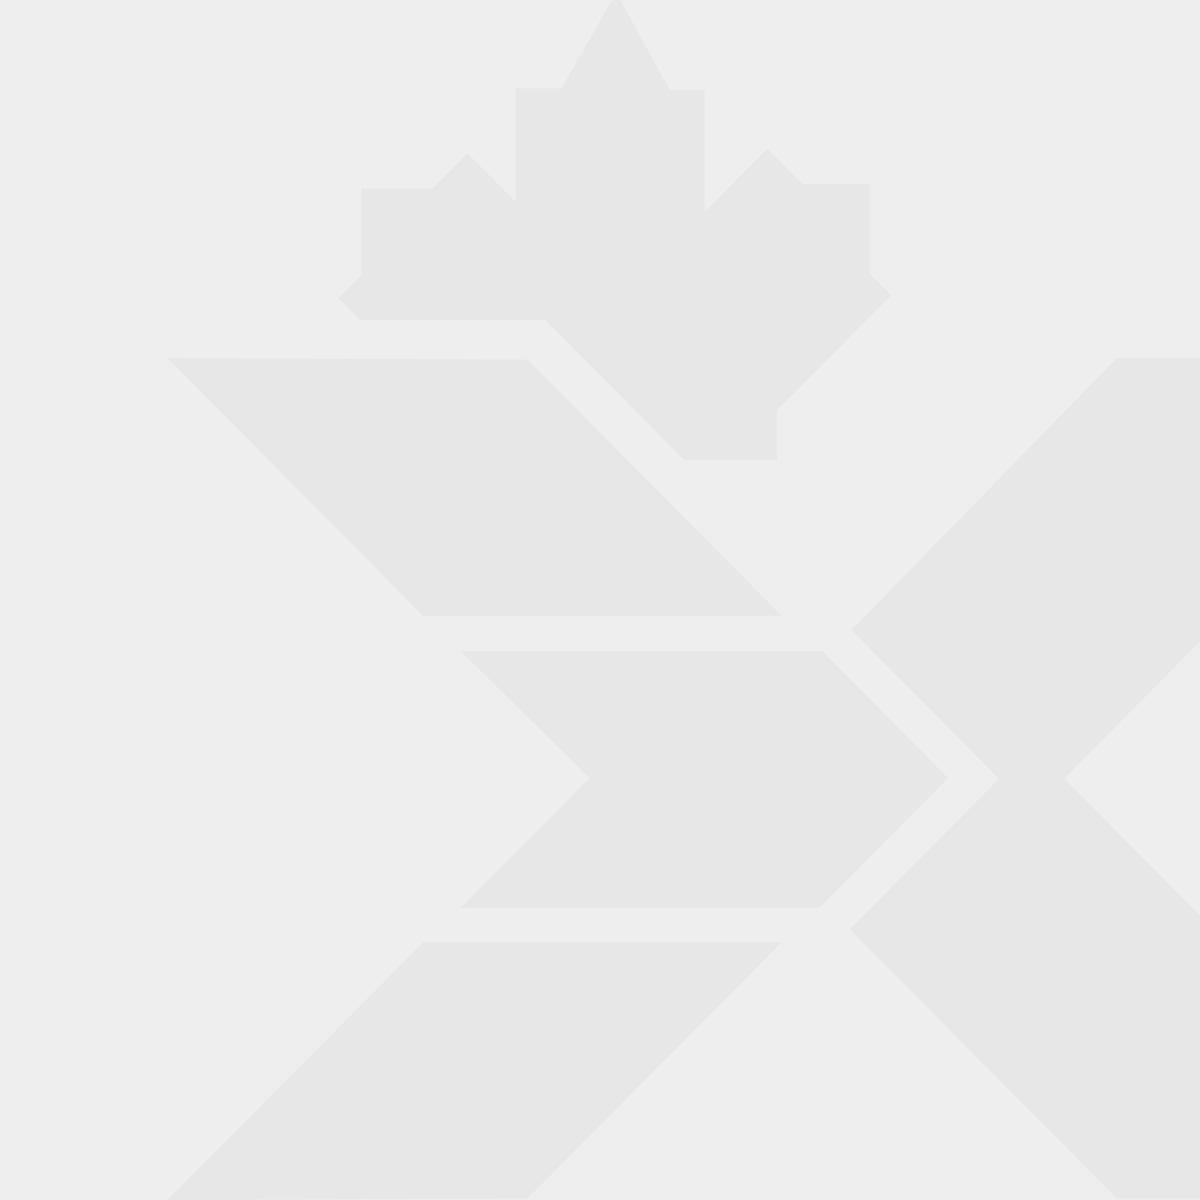 The Royal Canadian Legion National War Memorial Commemorative Pin